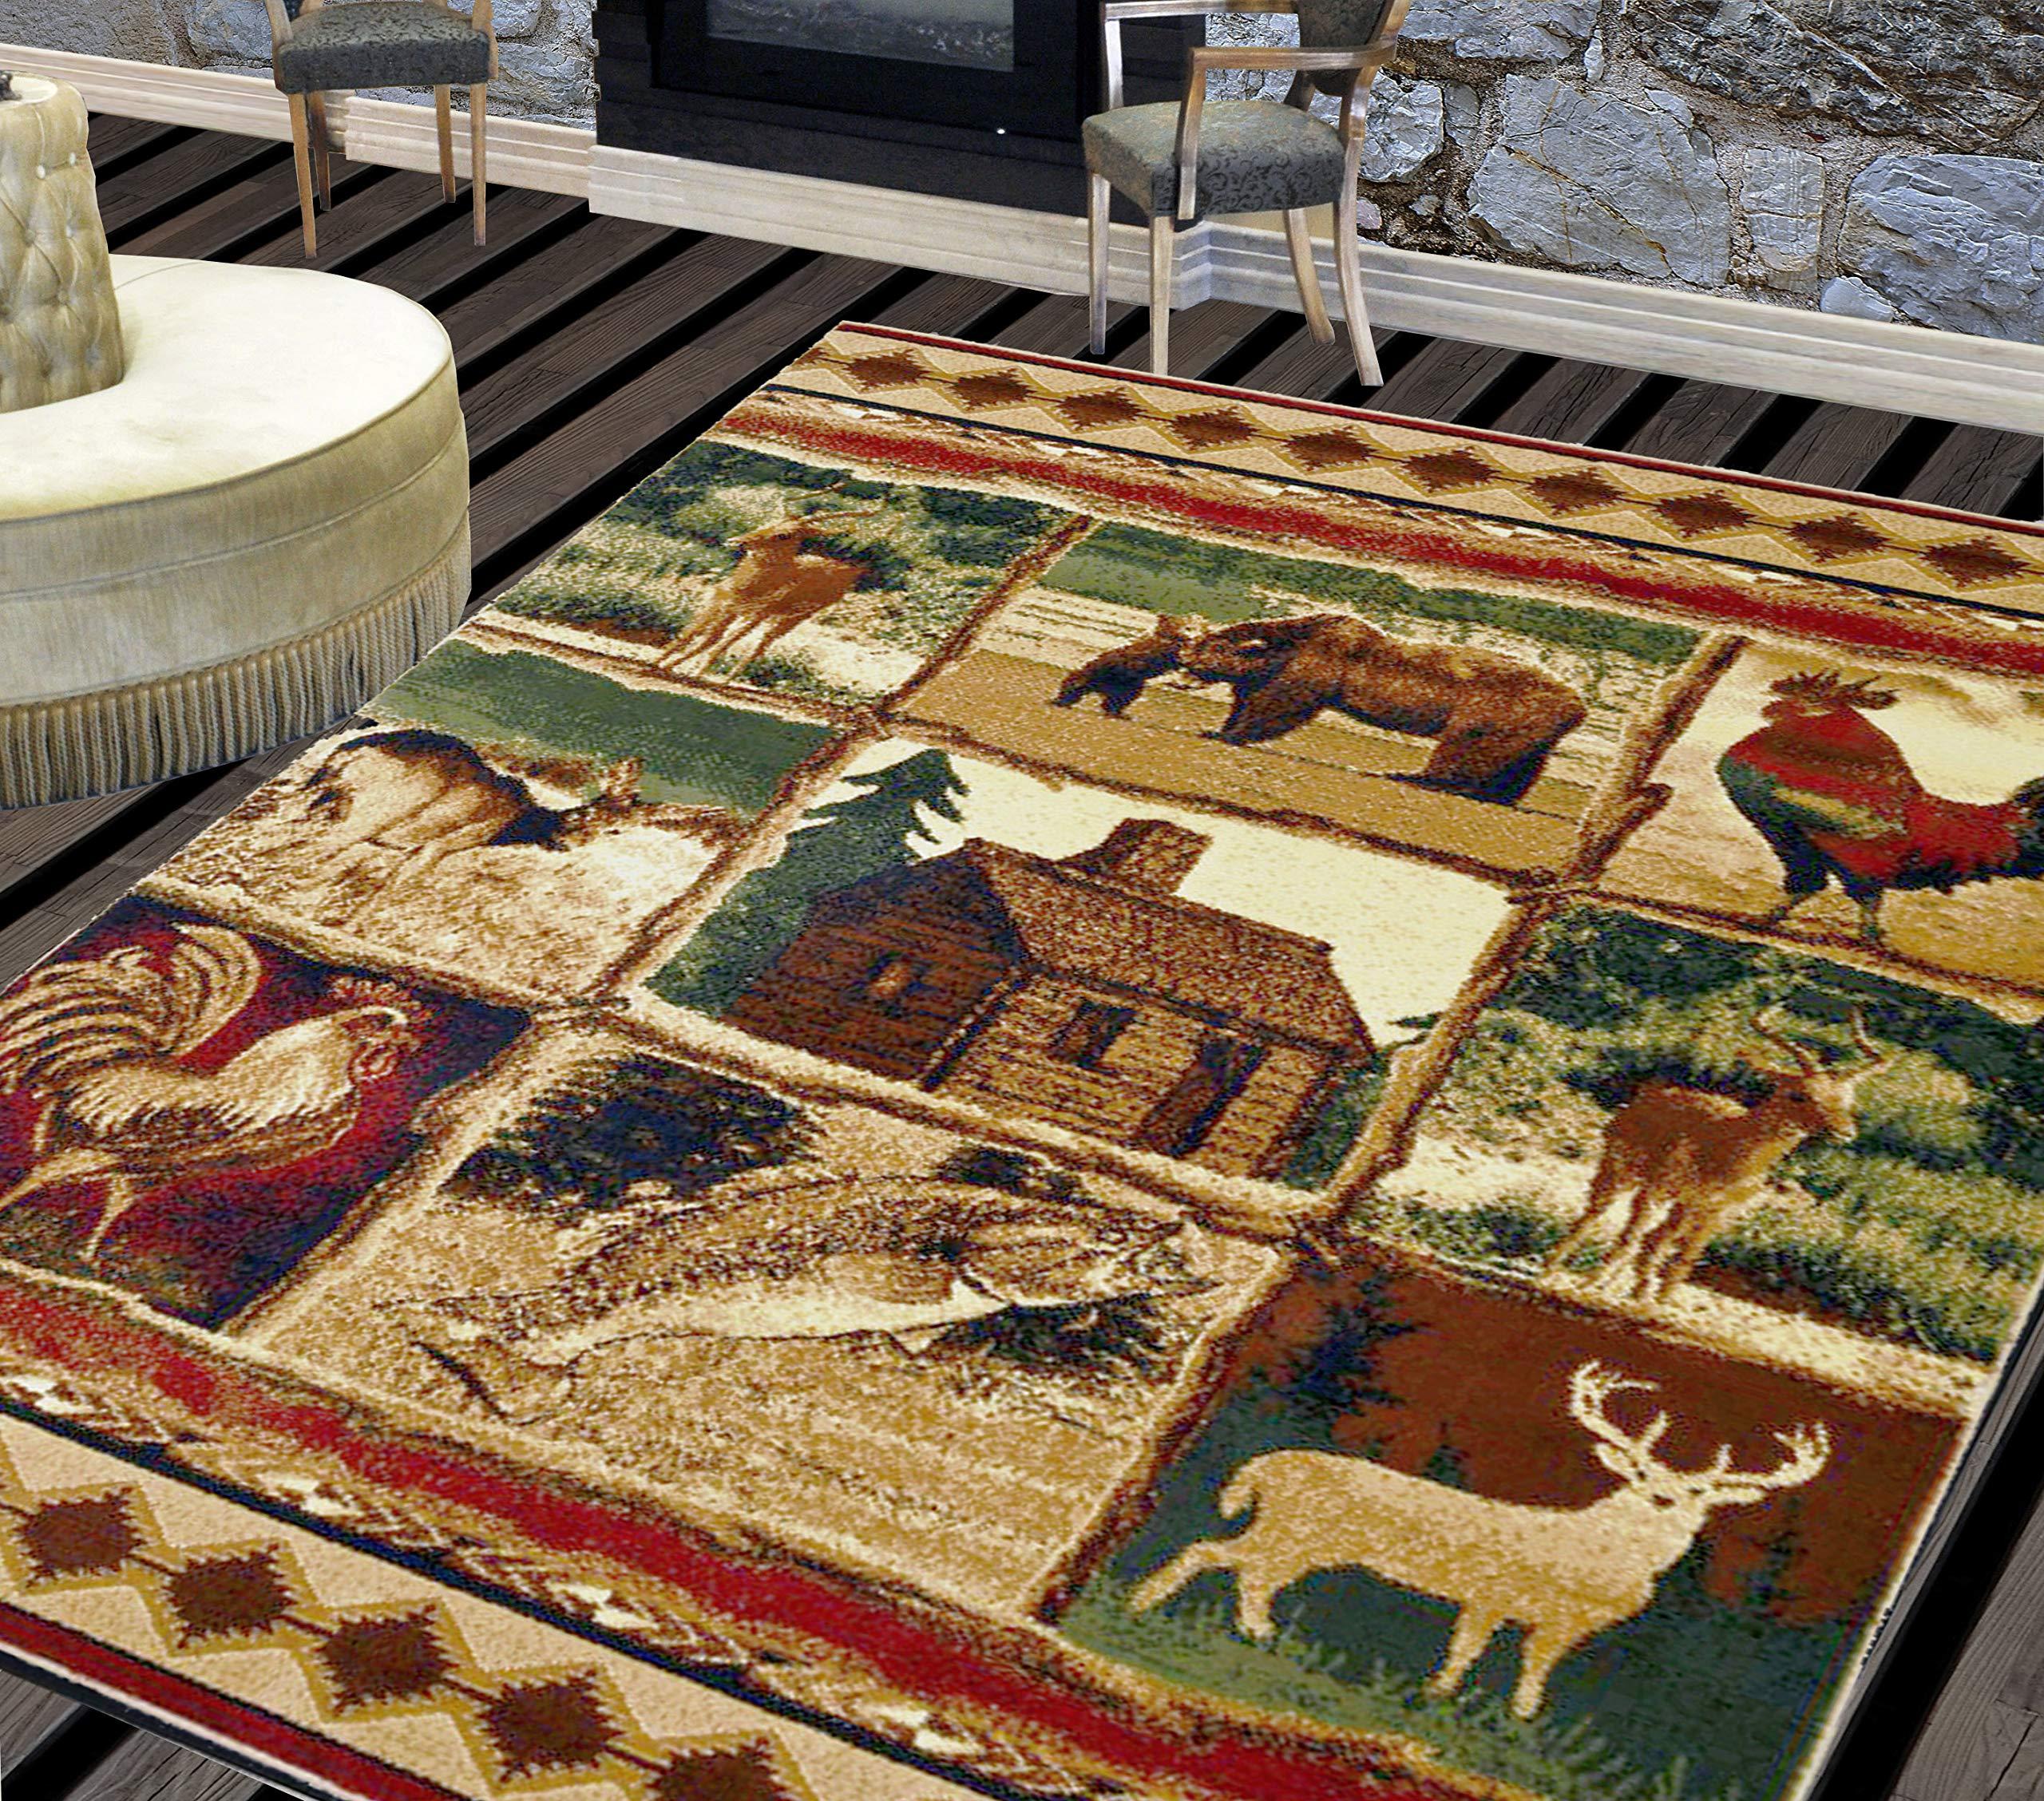 Lodge Rugs Cabin Decor Area 5x7 Rooster Rug Bohemian Flooring Carpet Carpets Rateshop Home Garden